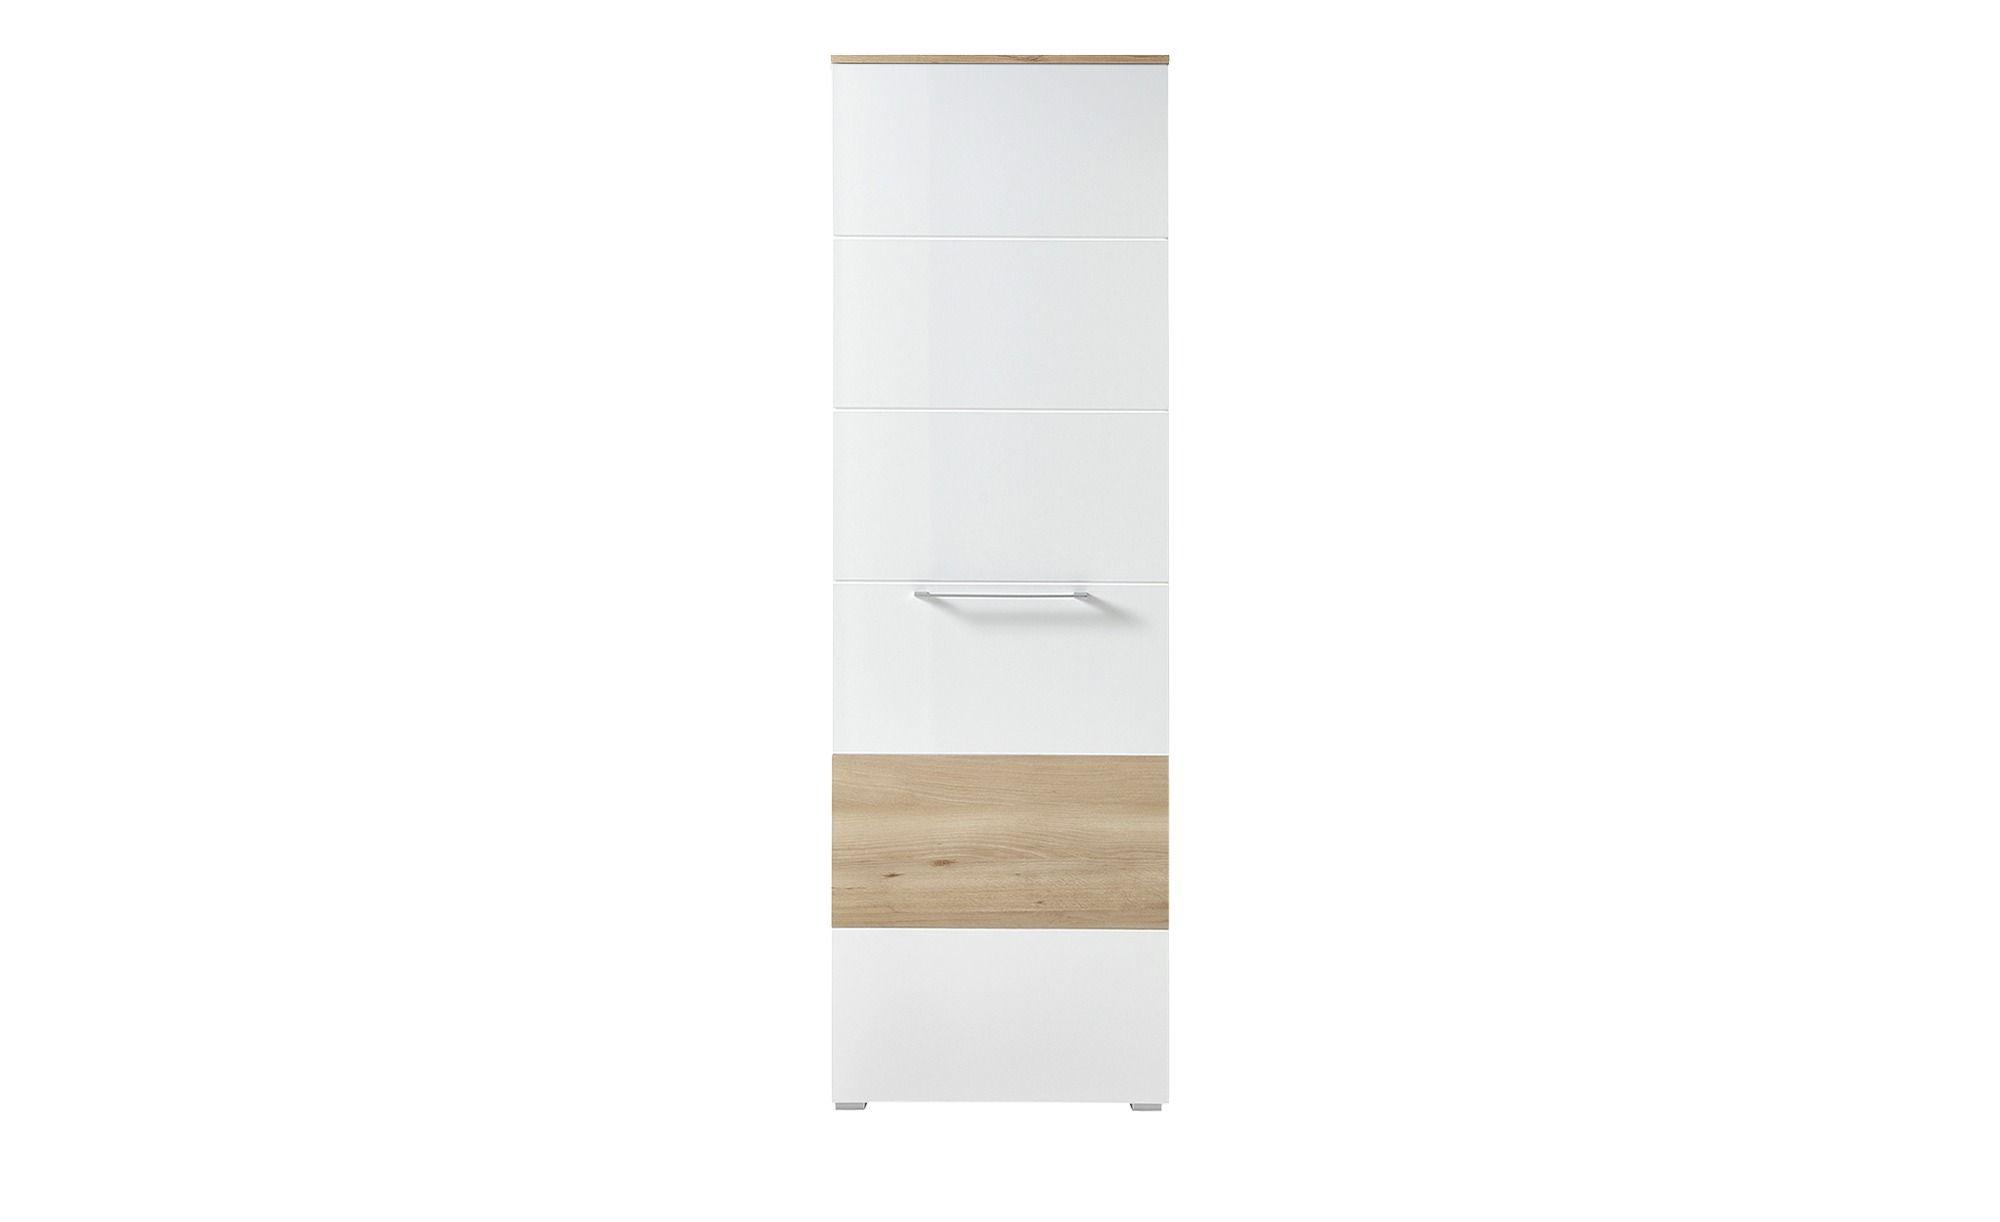 Uno Garderobenpaneel Stripe Garderobenpaneel Garderobenbank Und